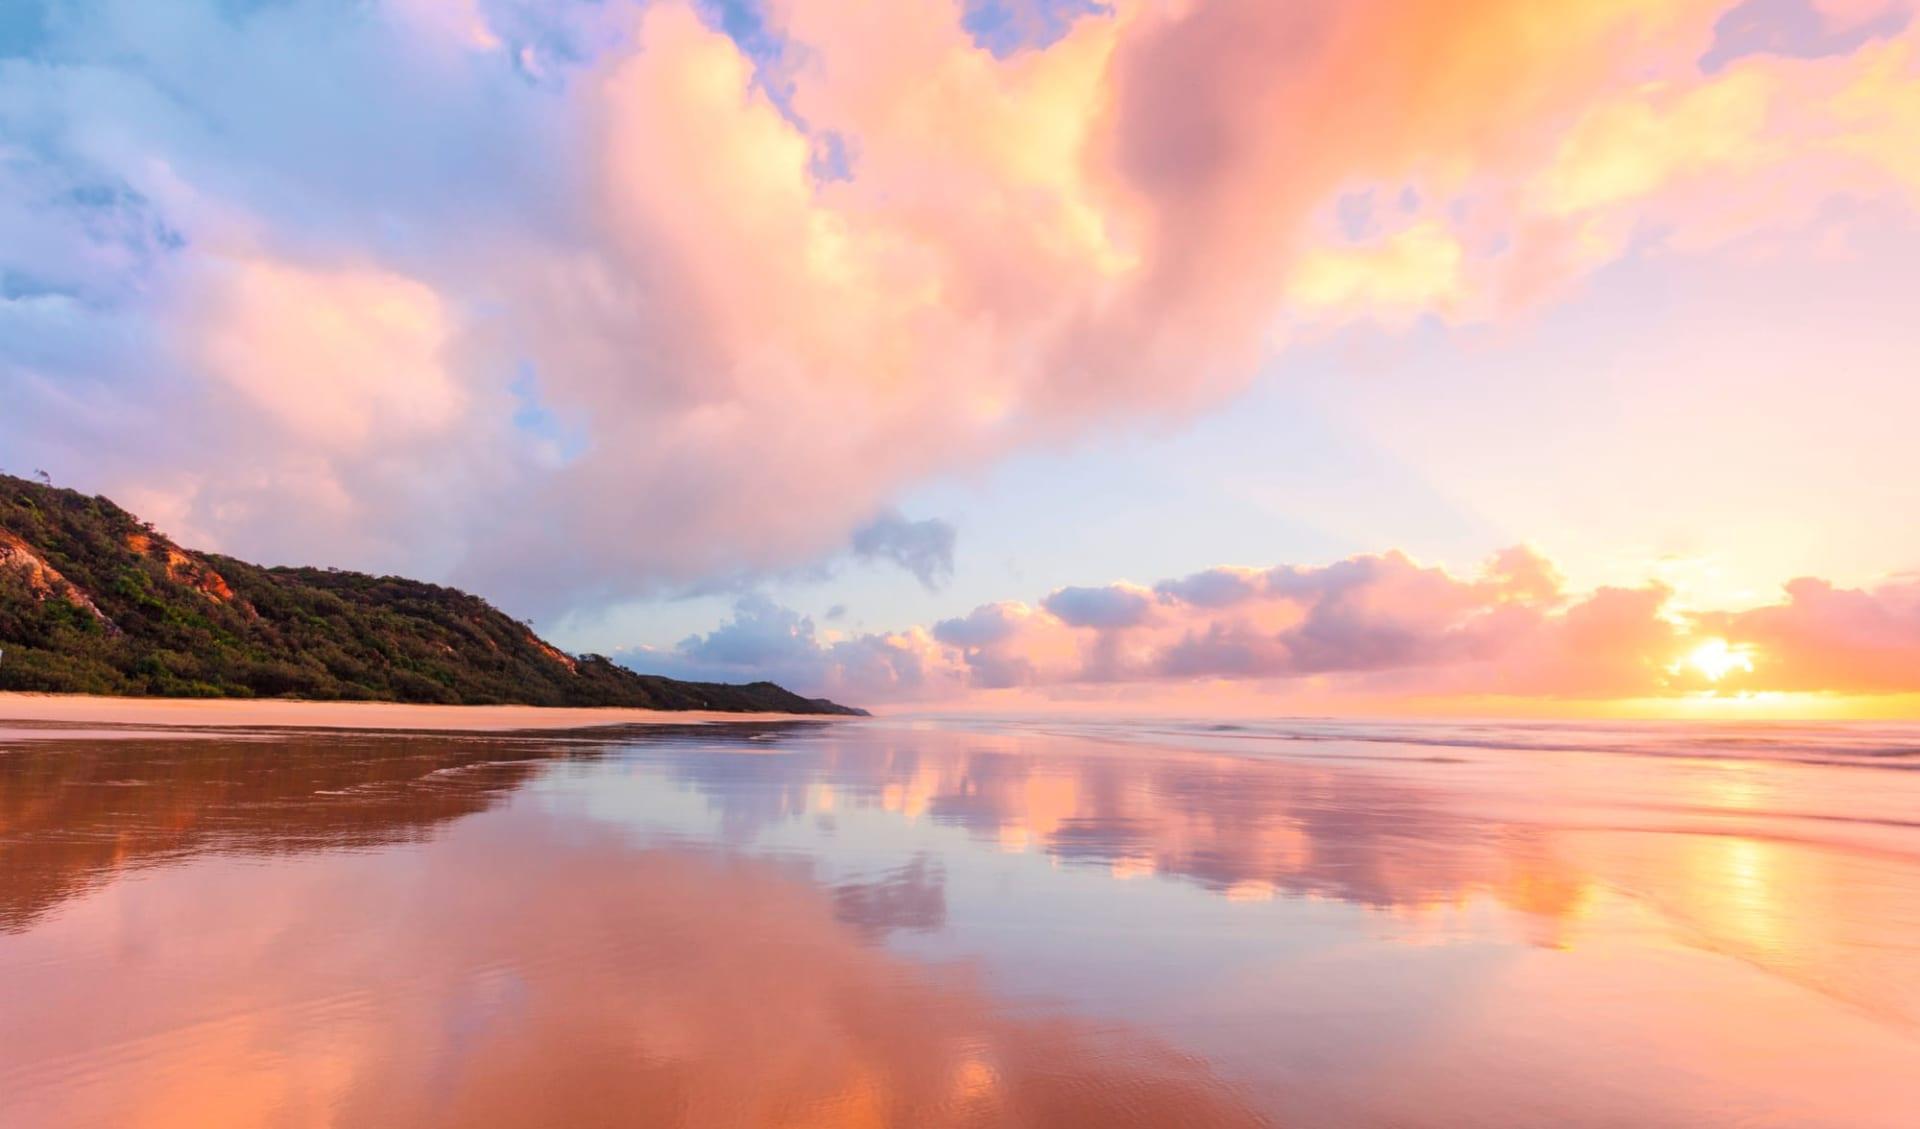 East Coast Beachin' ab Sydney: Australia - Queensland - Fraser Island - Strand bei Sonnenuntergang c_shutterstock